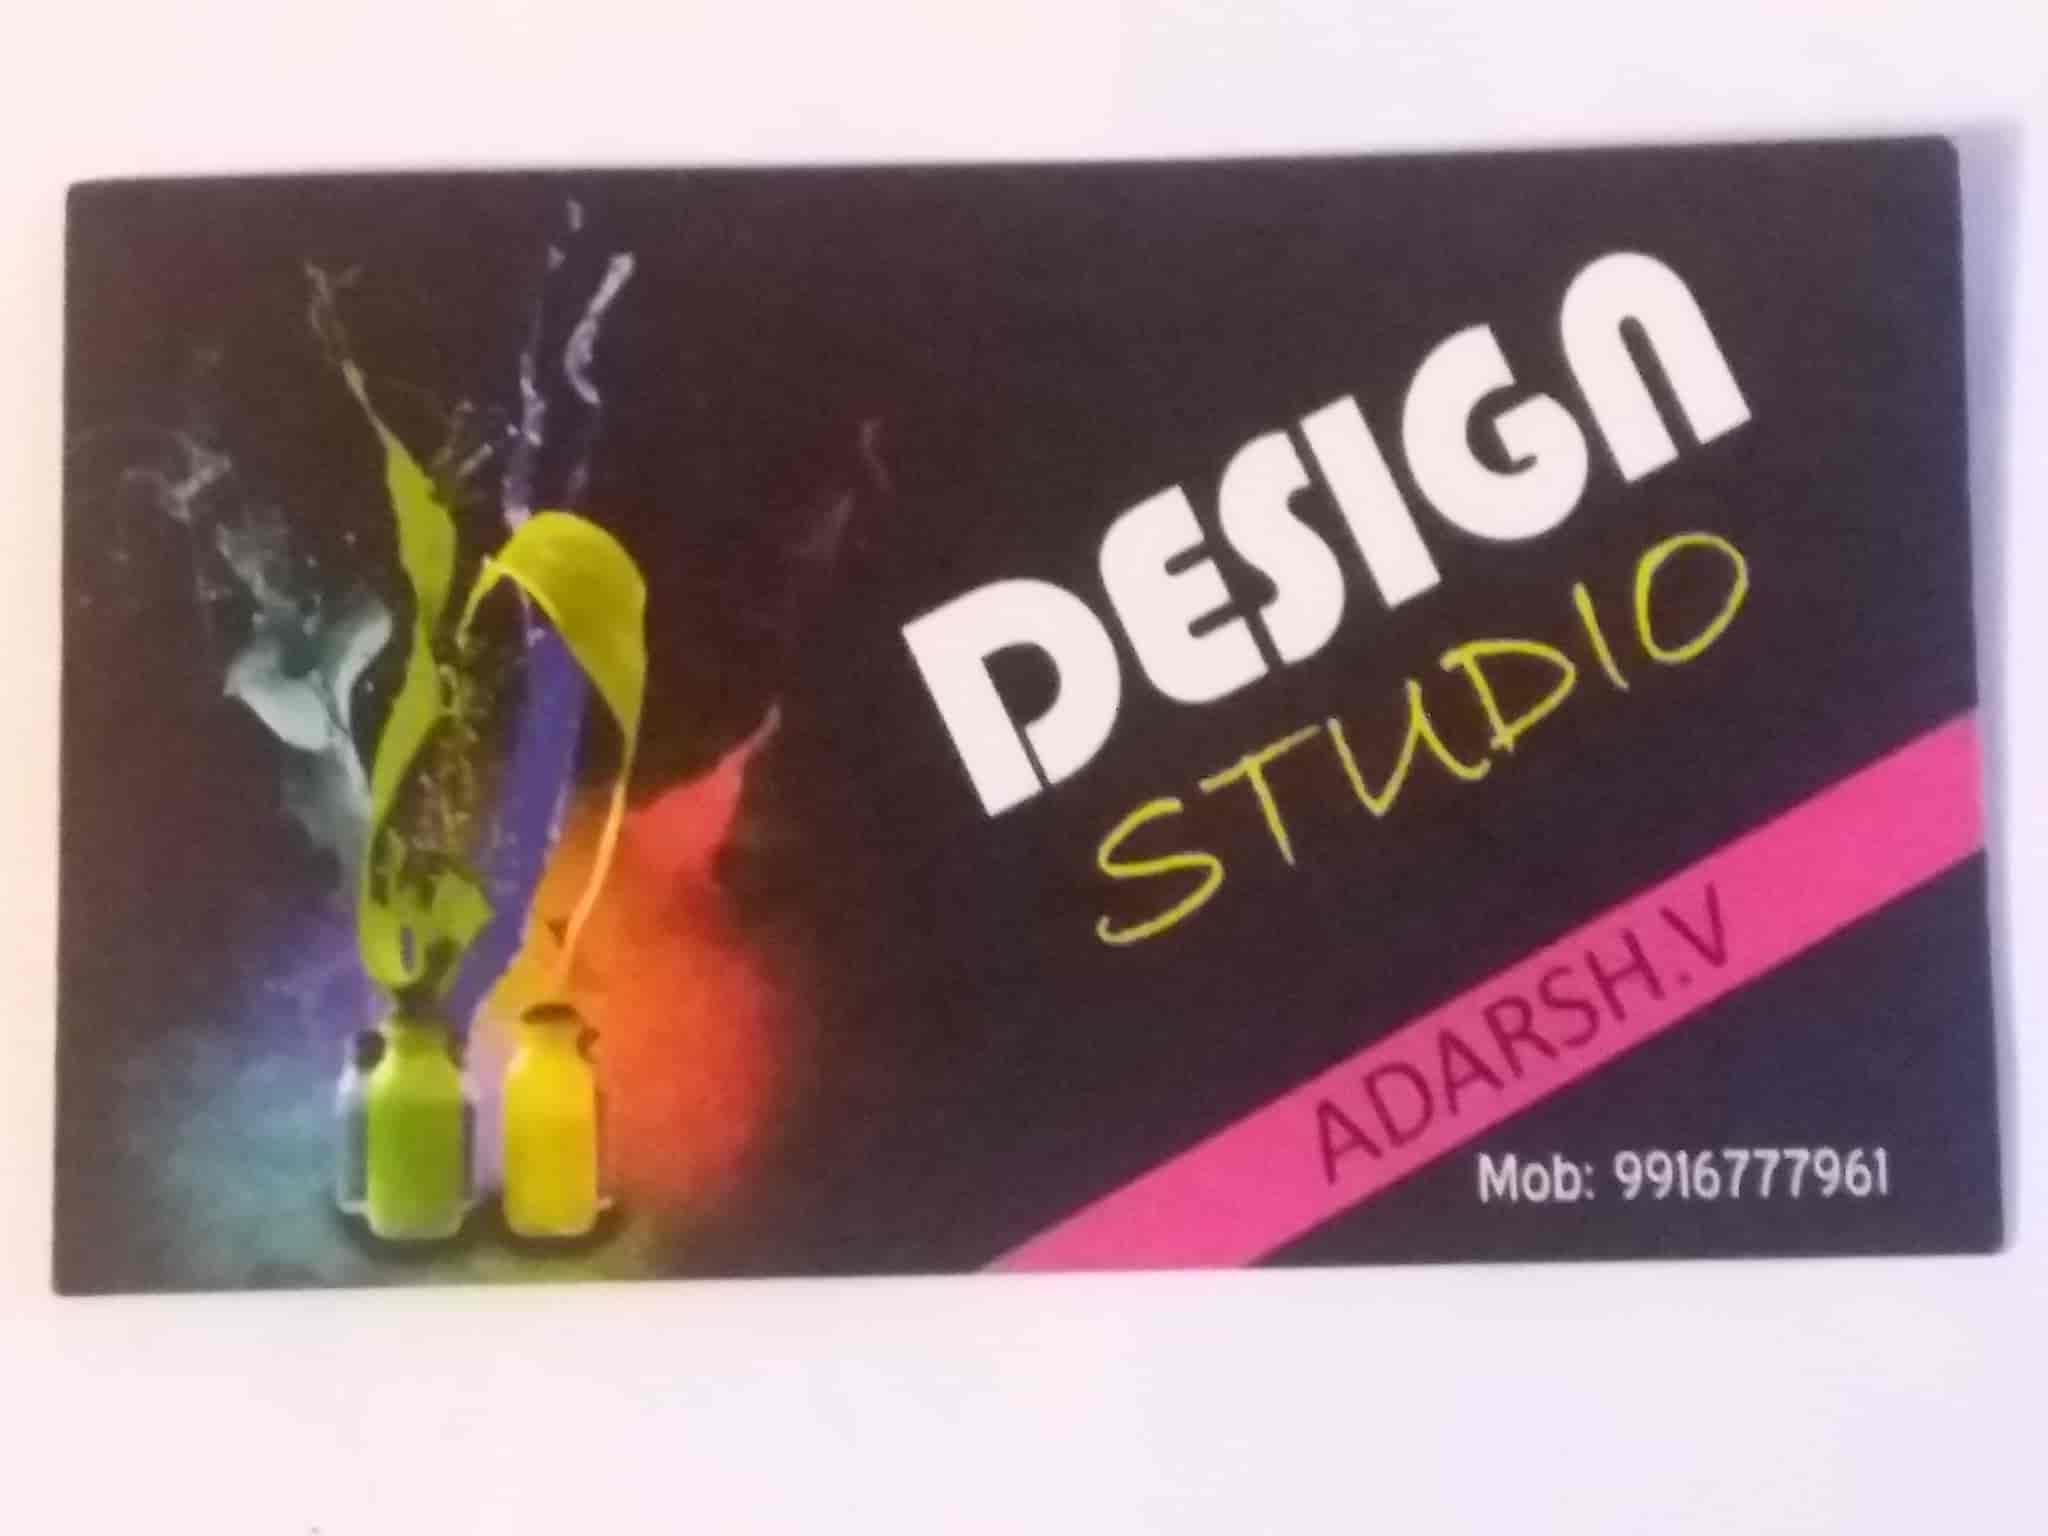 Usa Design Studio, Hebbal - Flex Printing Services in Mysore